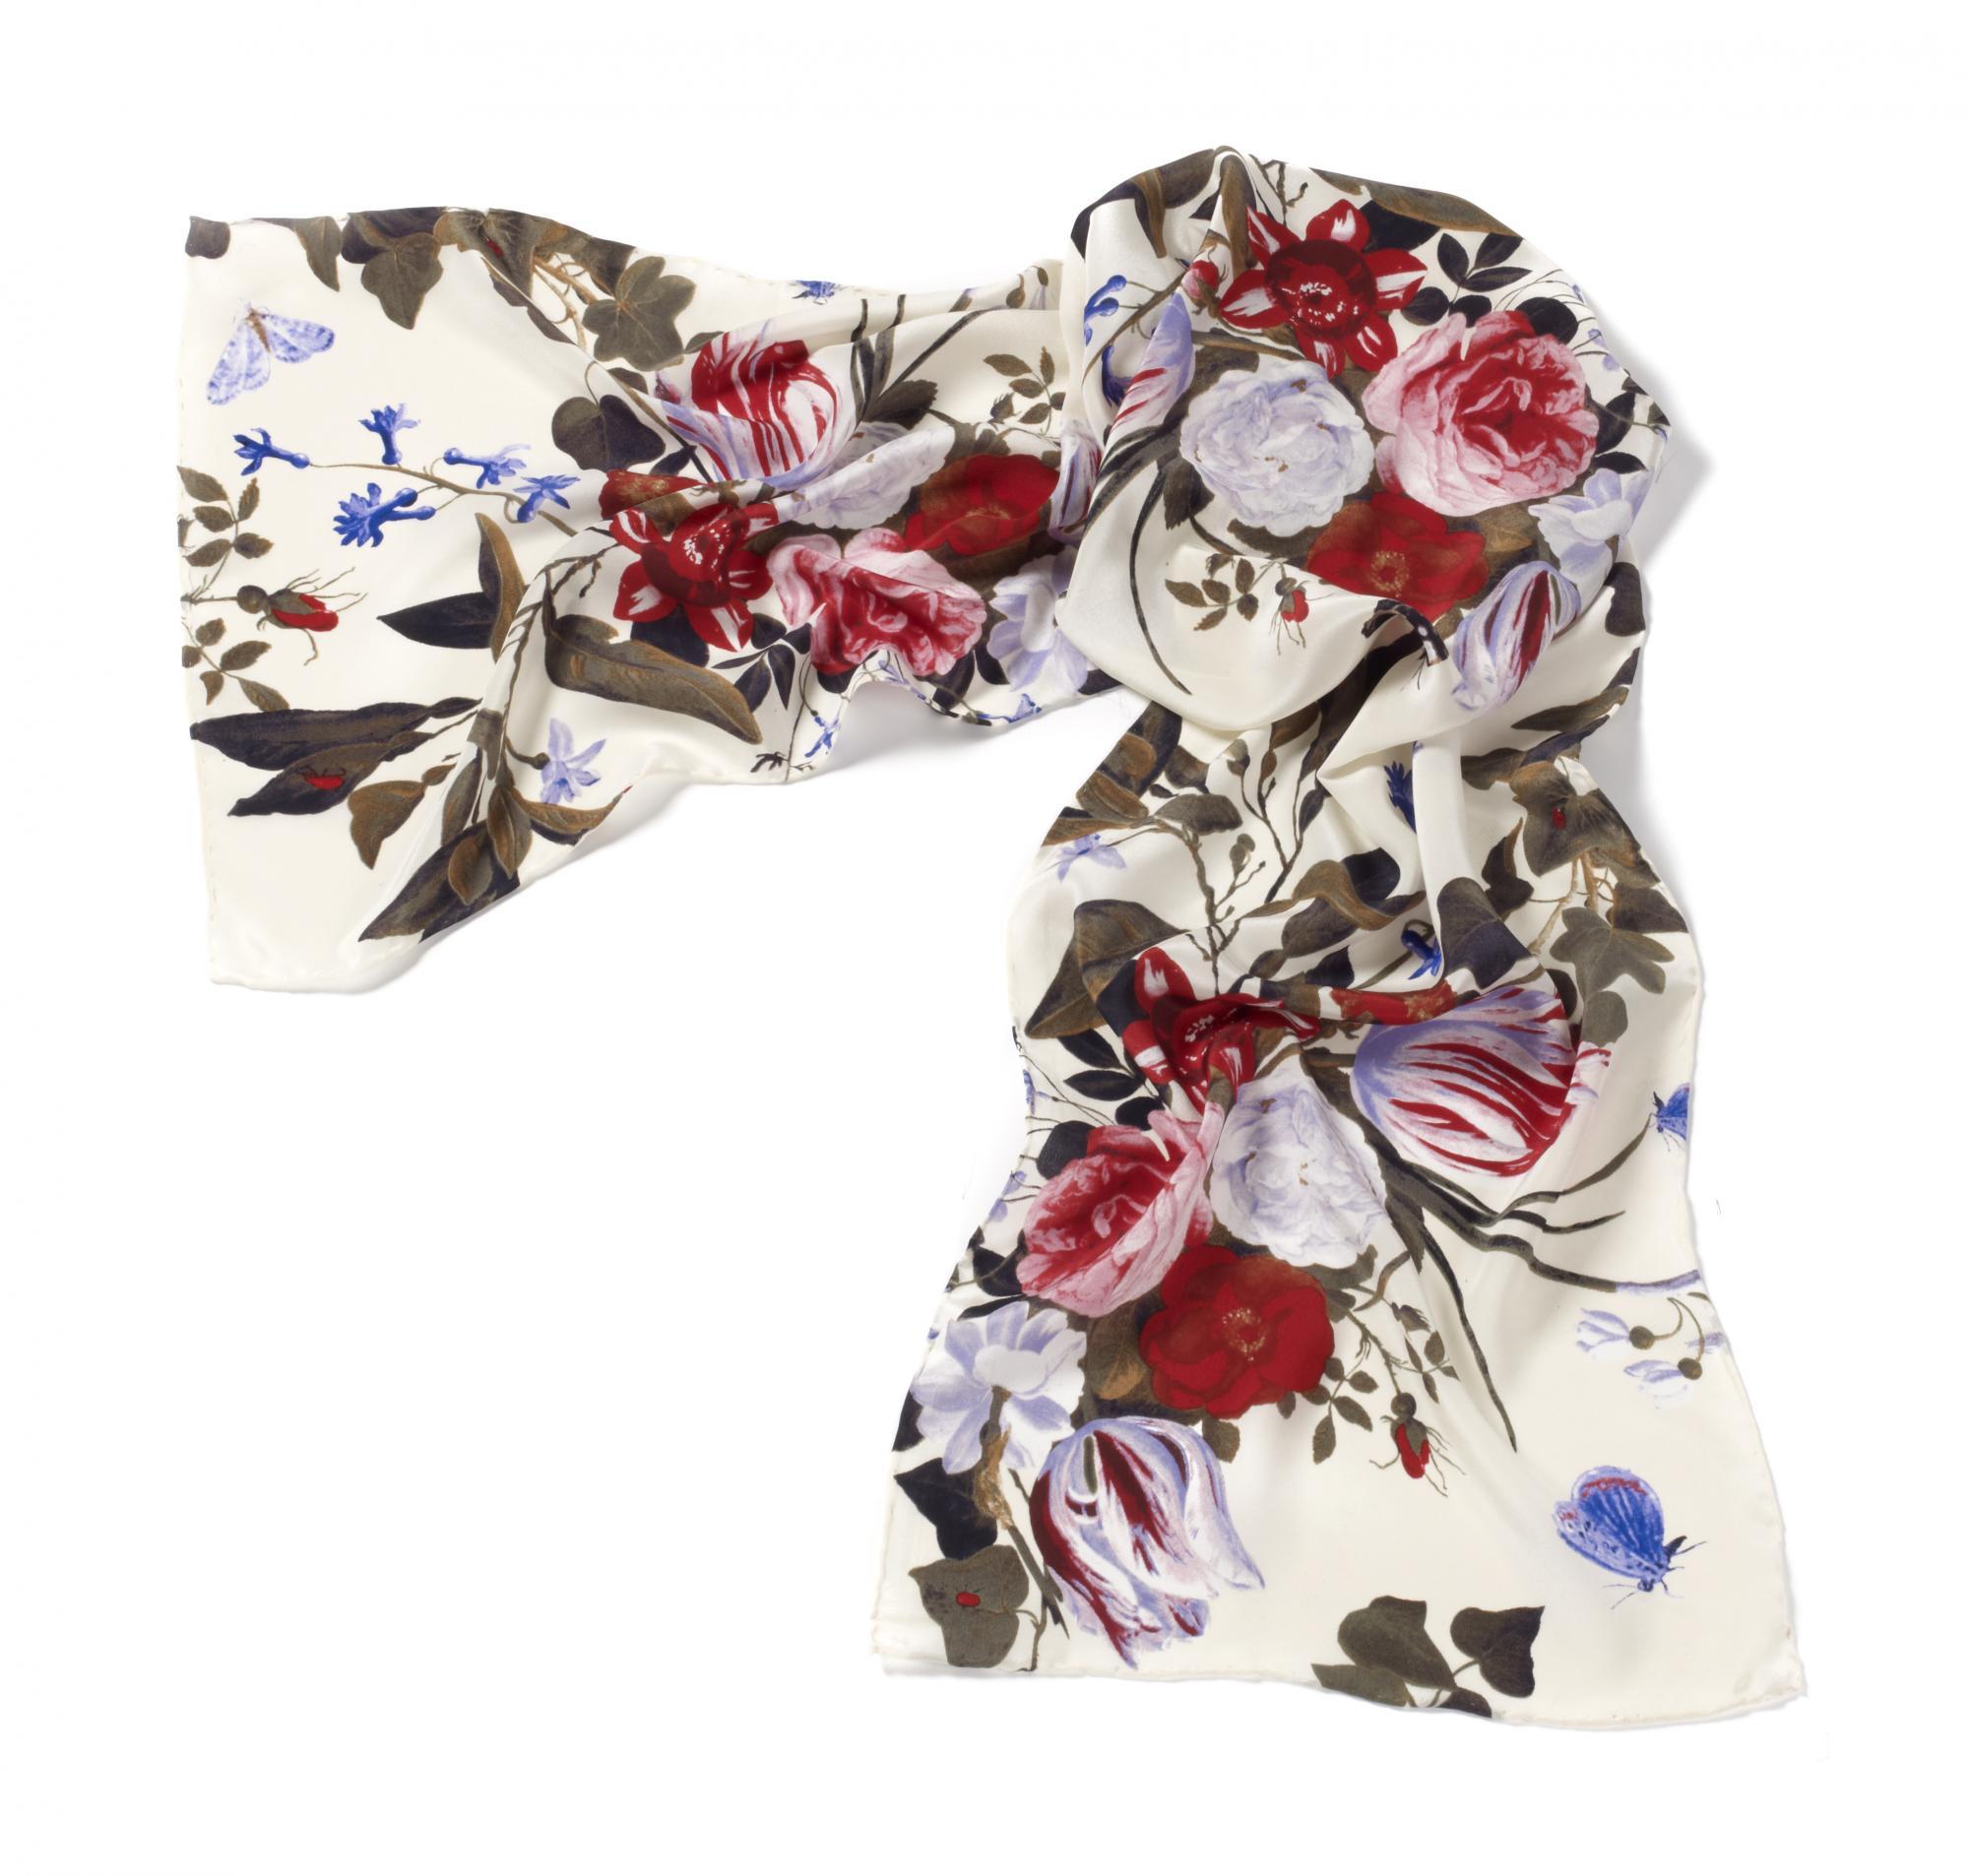 Still Life by Jan van Kessel silk scarf